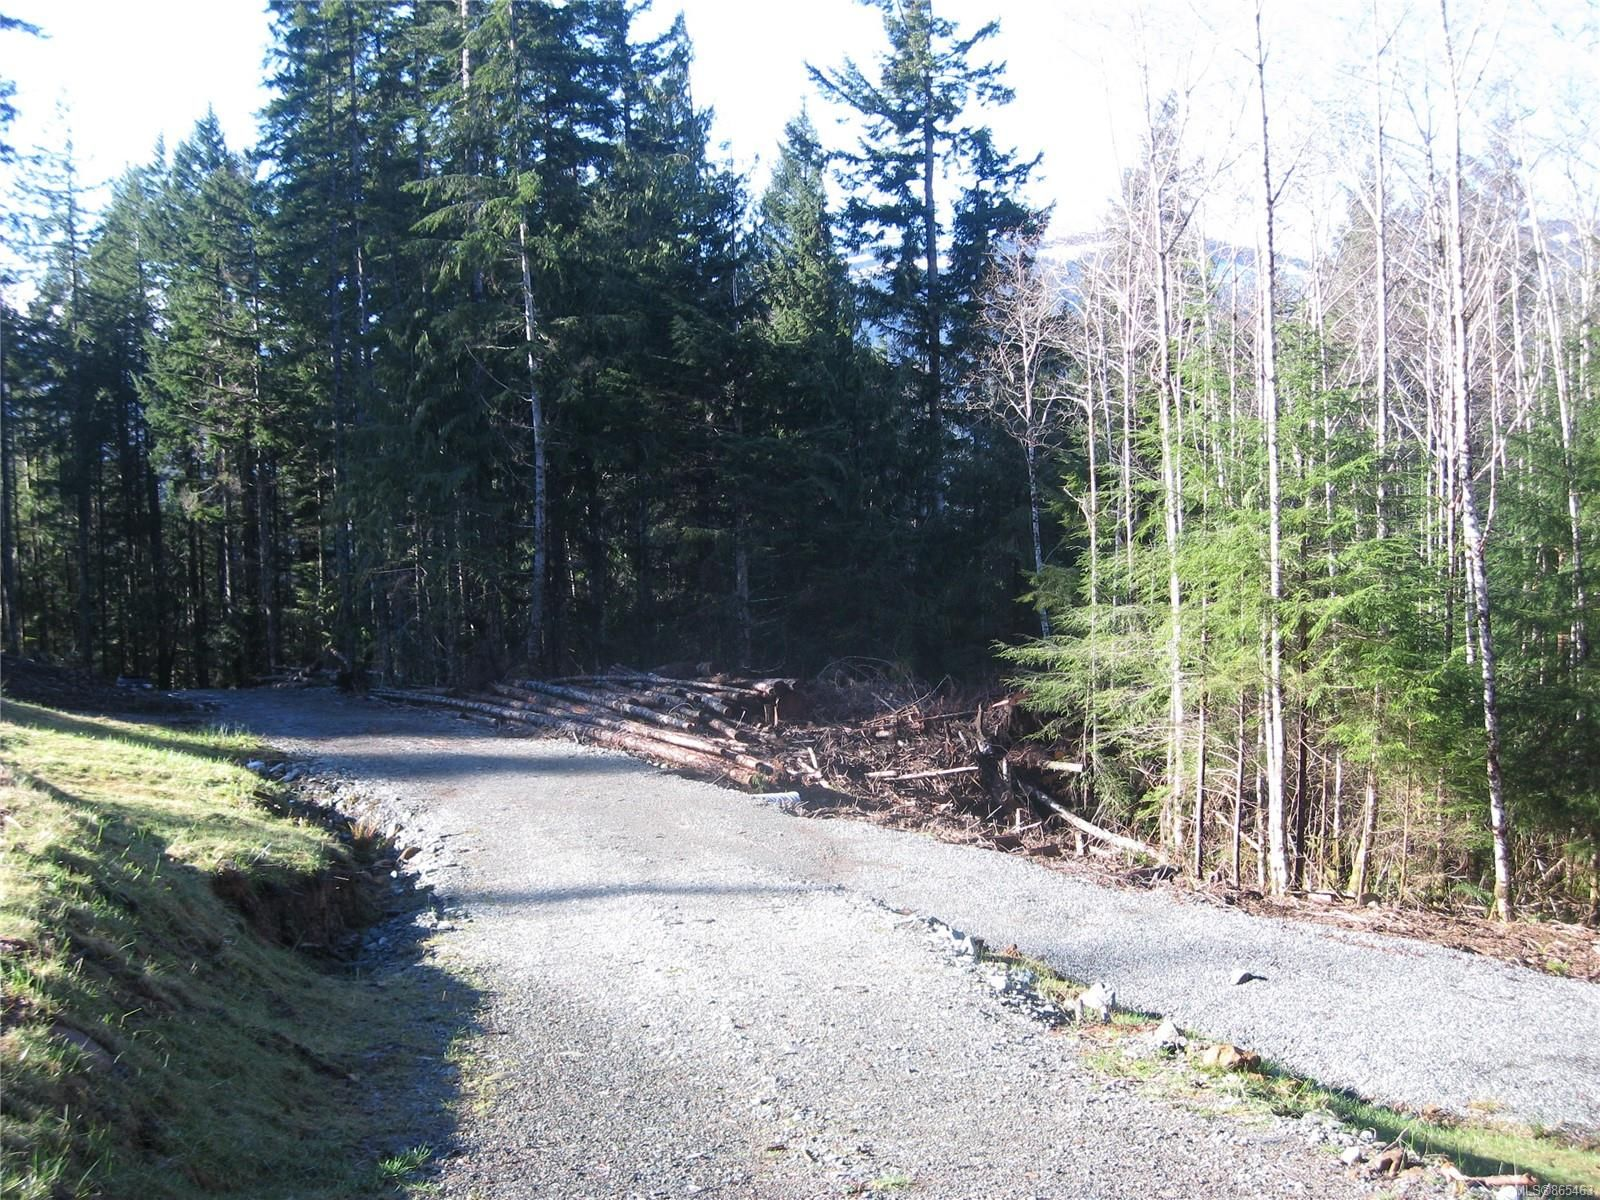 Photo 14: Photos: 1230 Cottonwood Rd in : NI Kelsey Bay/Sayward Land for sale (North Island)  : MLS®# 865463